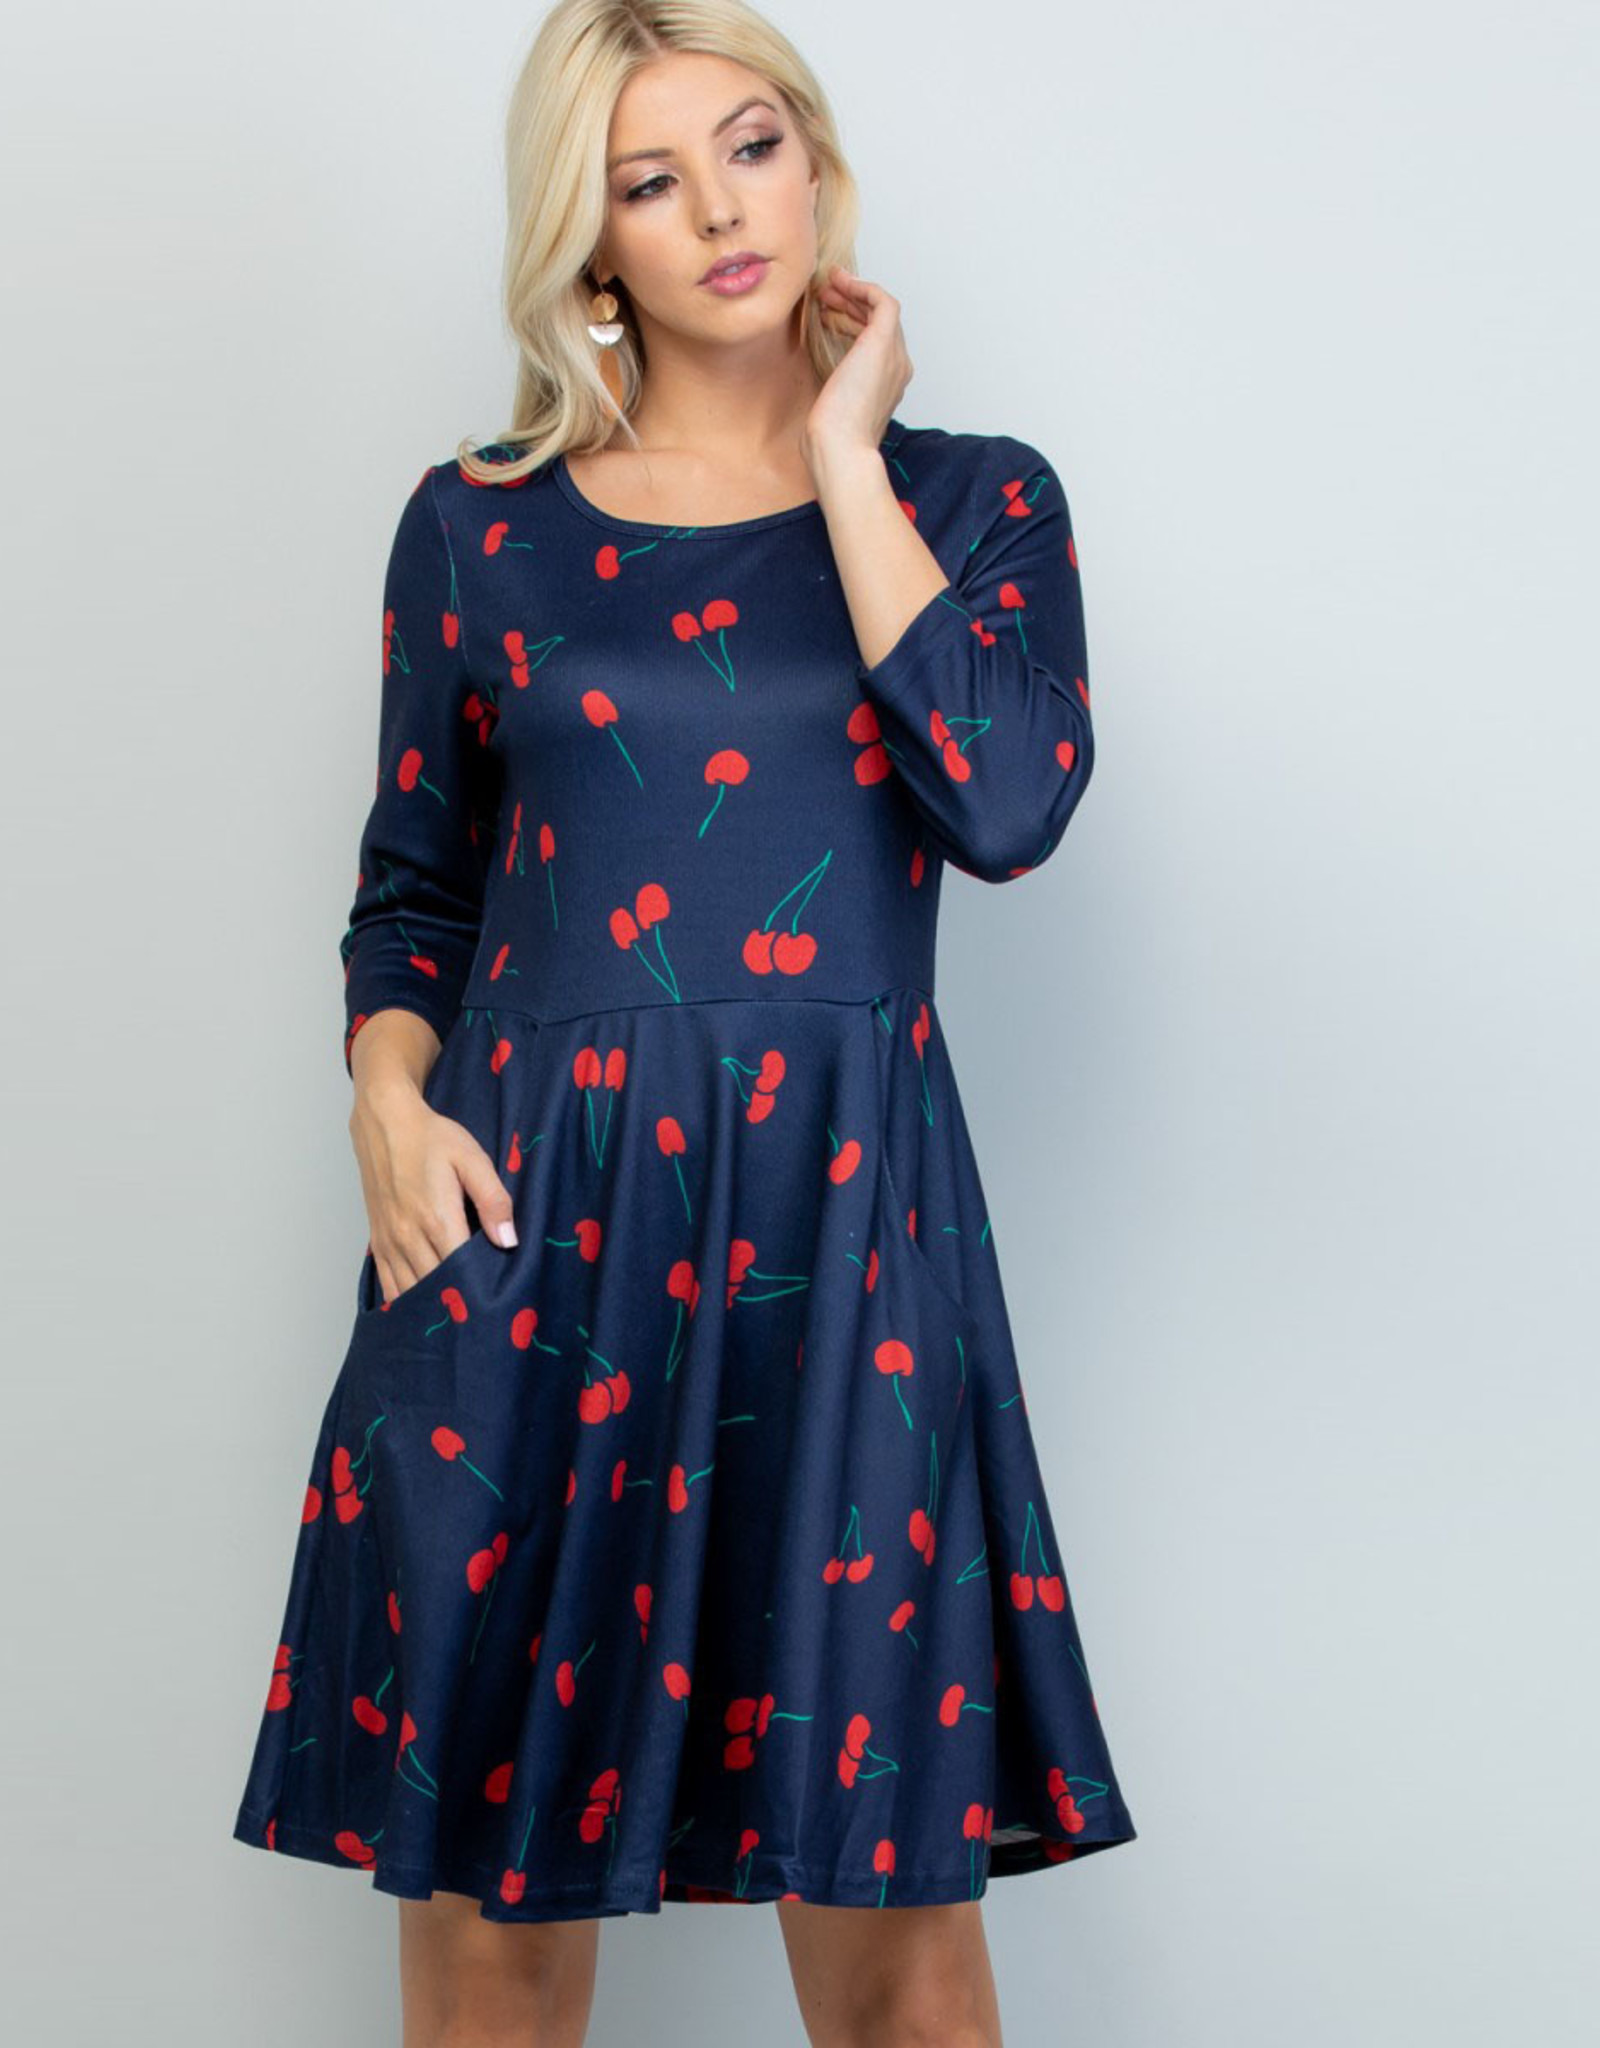 Cherry Print Tunic Dress (Navy)